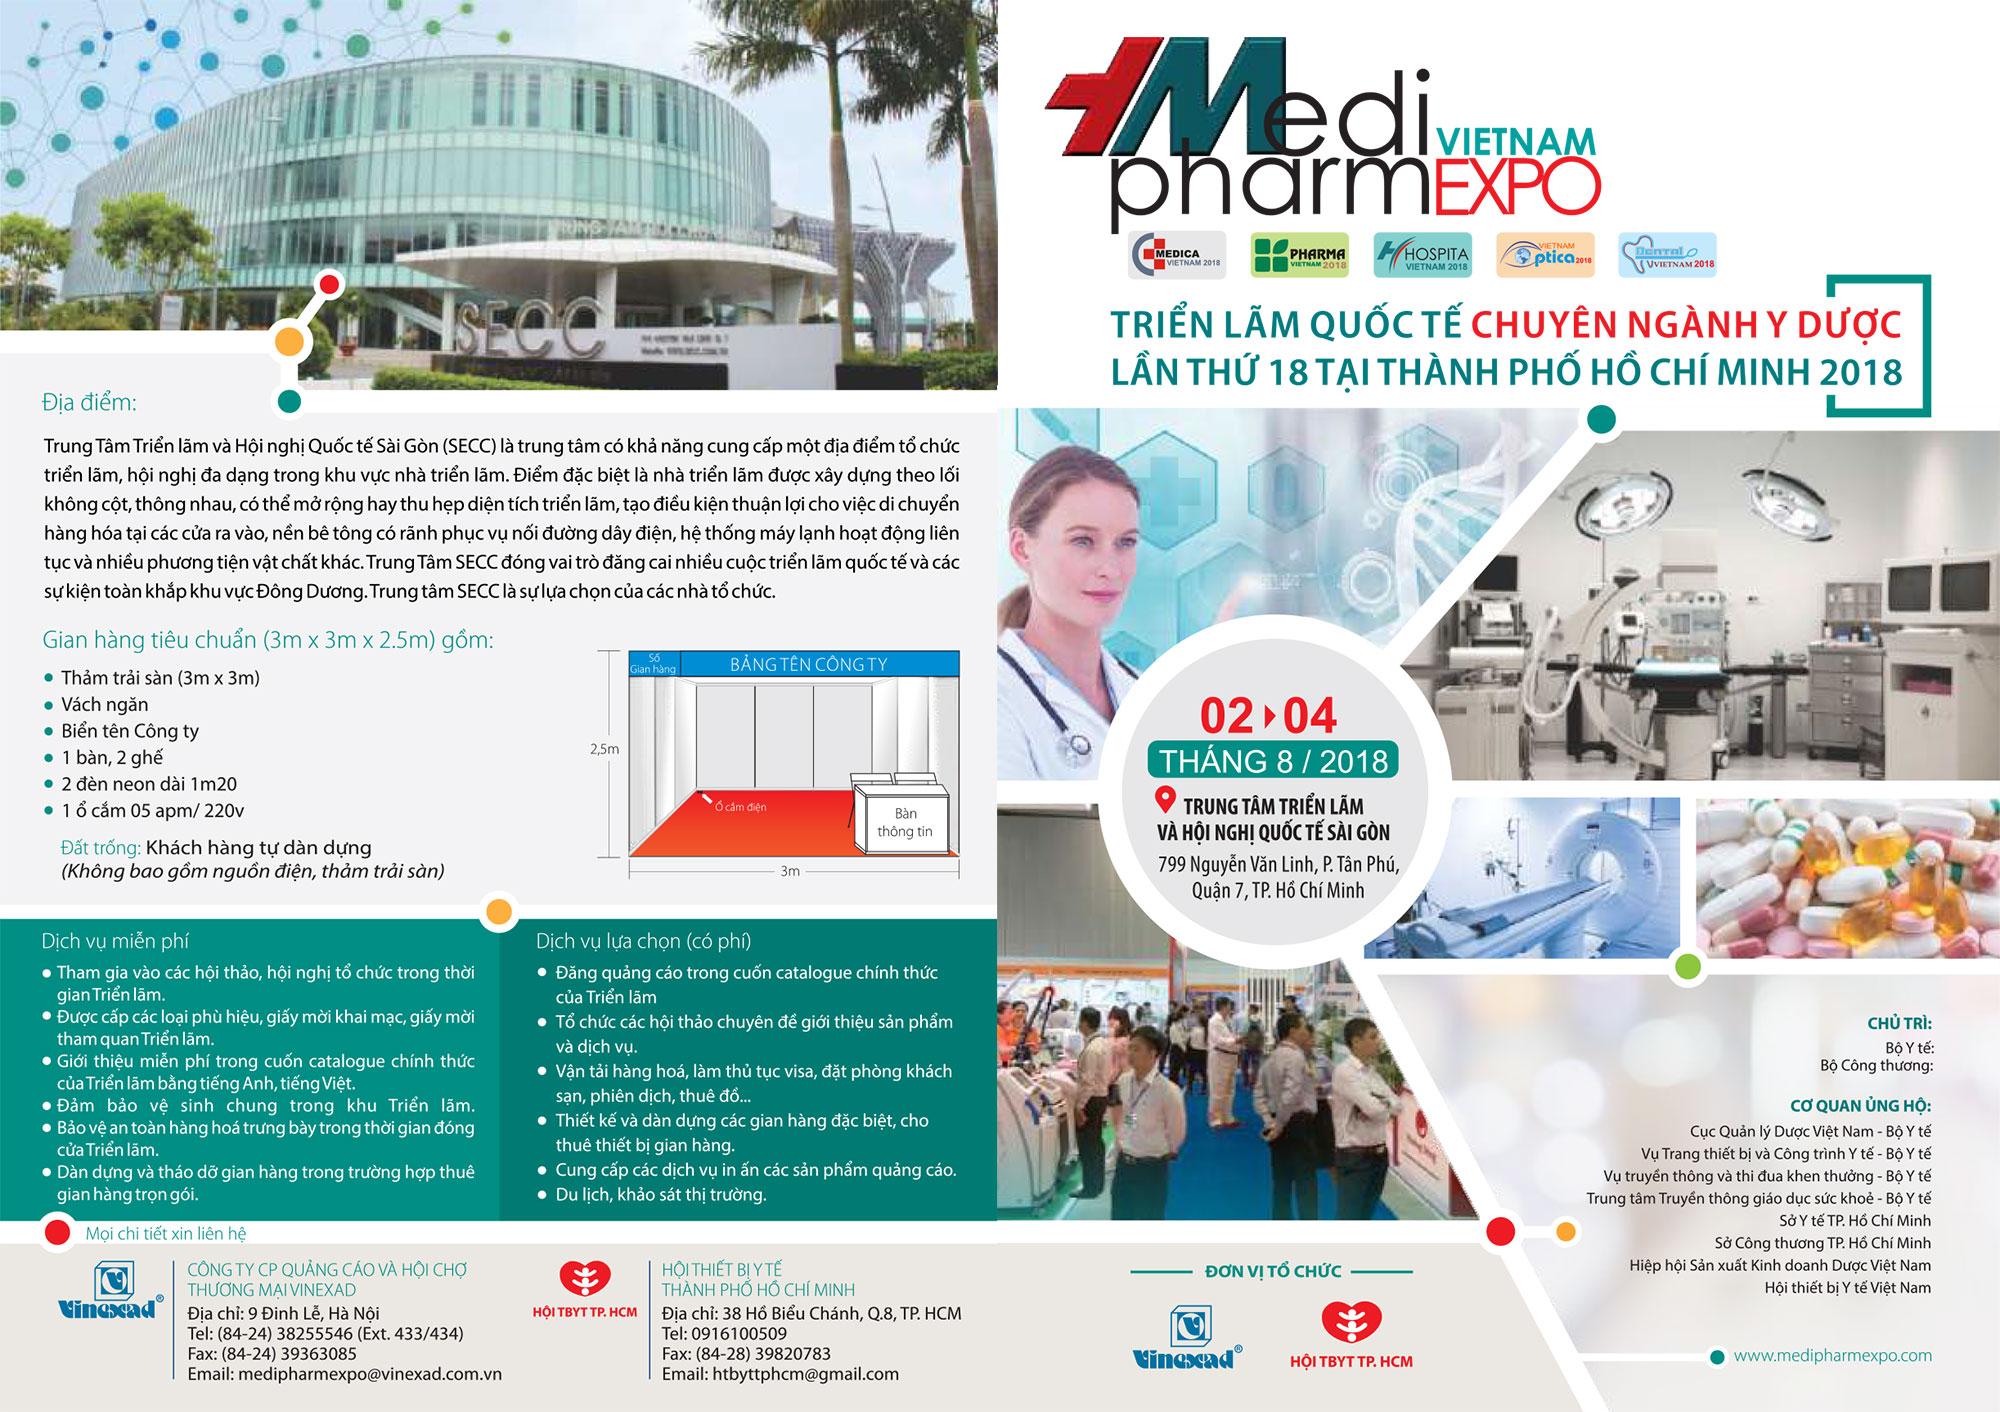 MPT THAM GIA TRIỂN LÃM VIETNAM MEDI-PHARM EXPO 2018